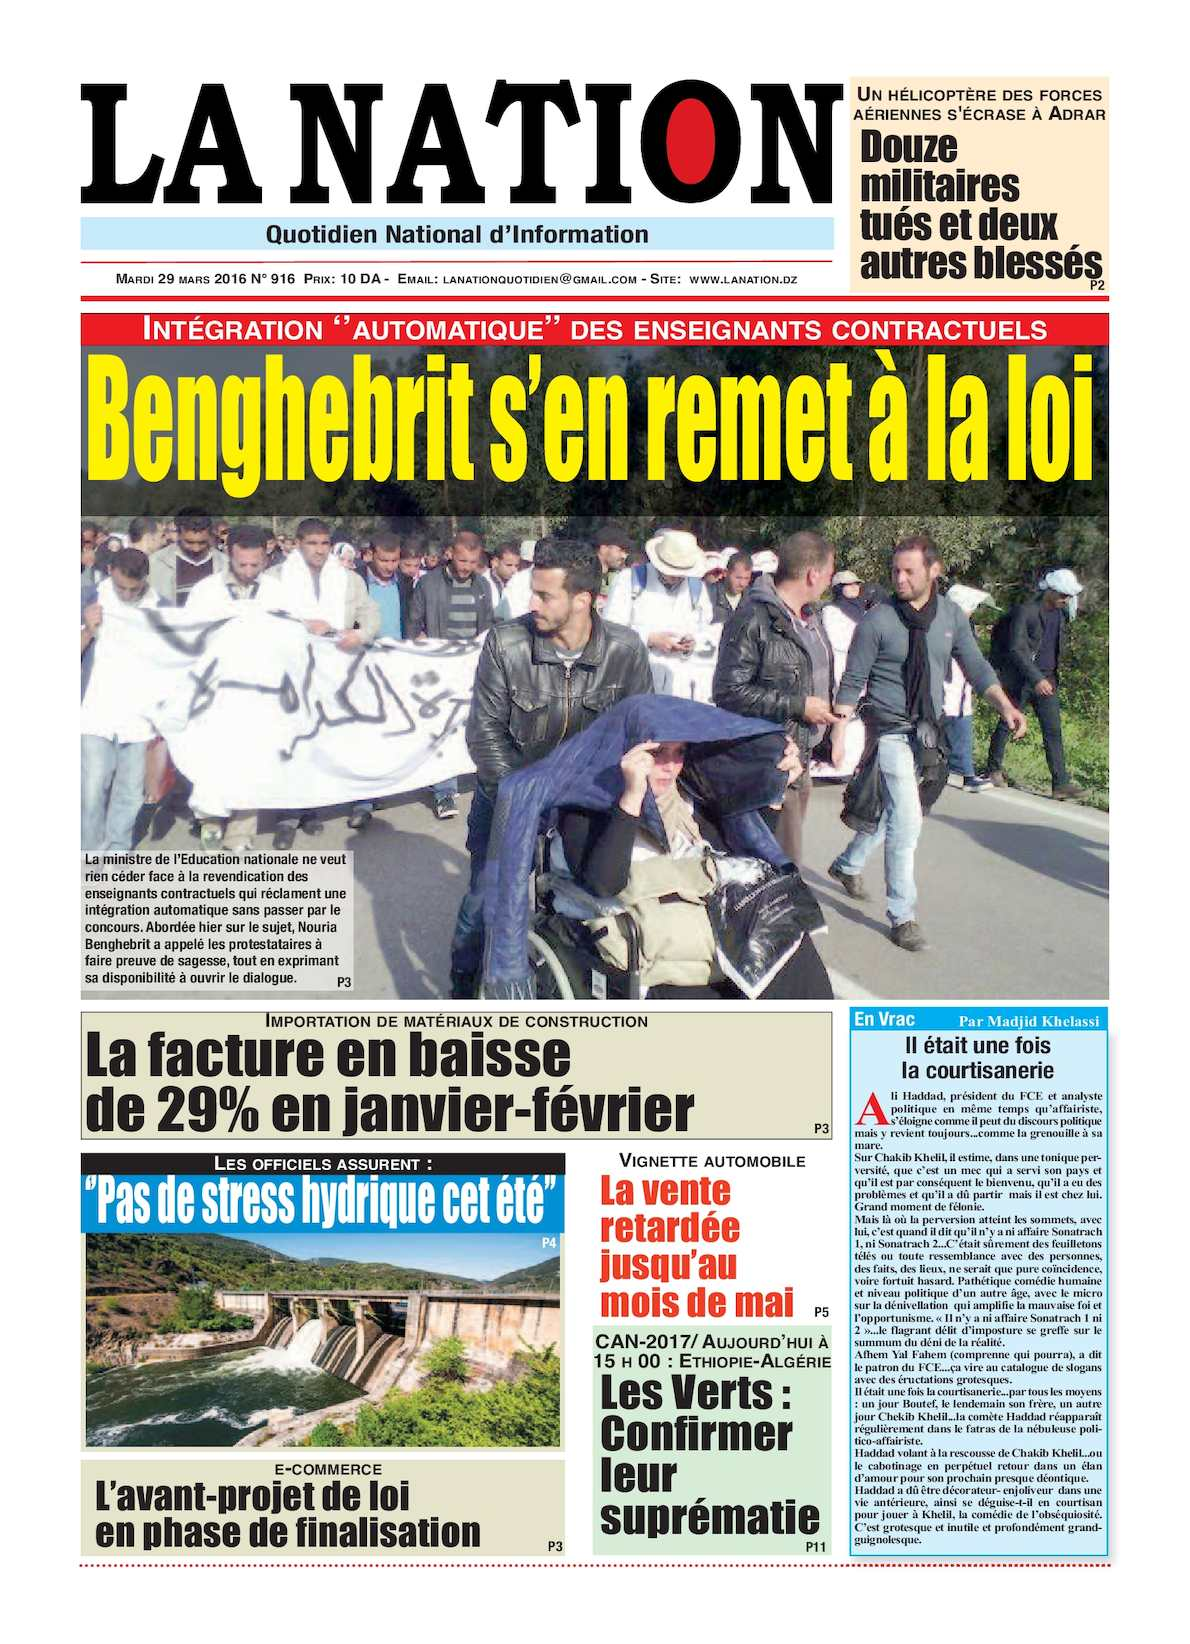 La Nation Edition N 916